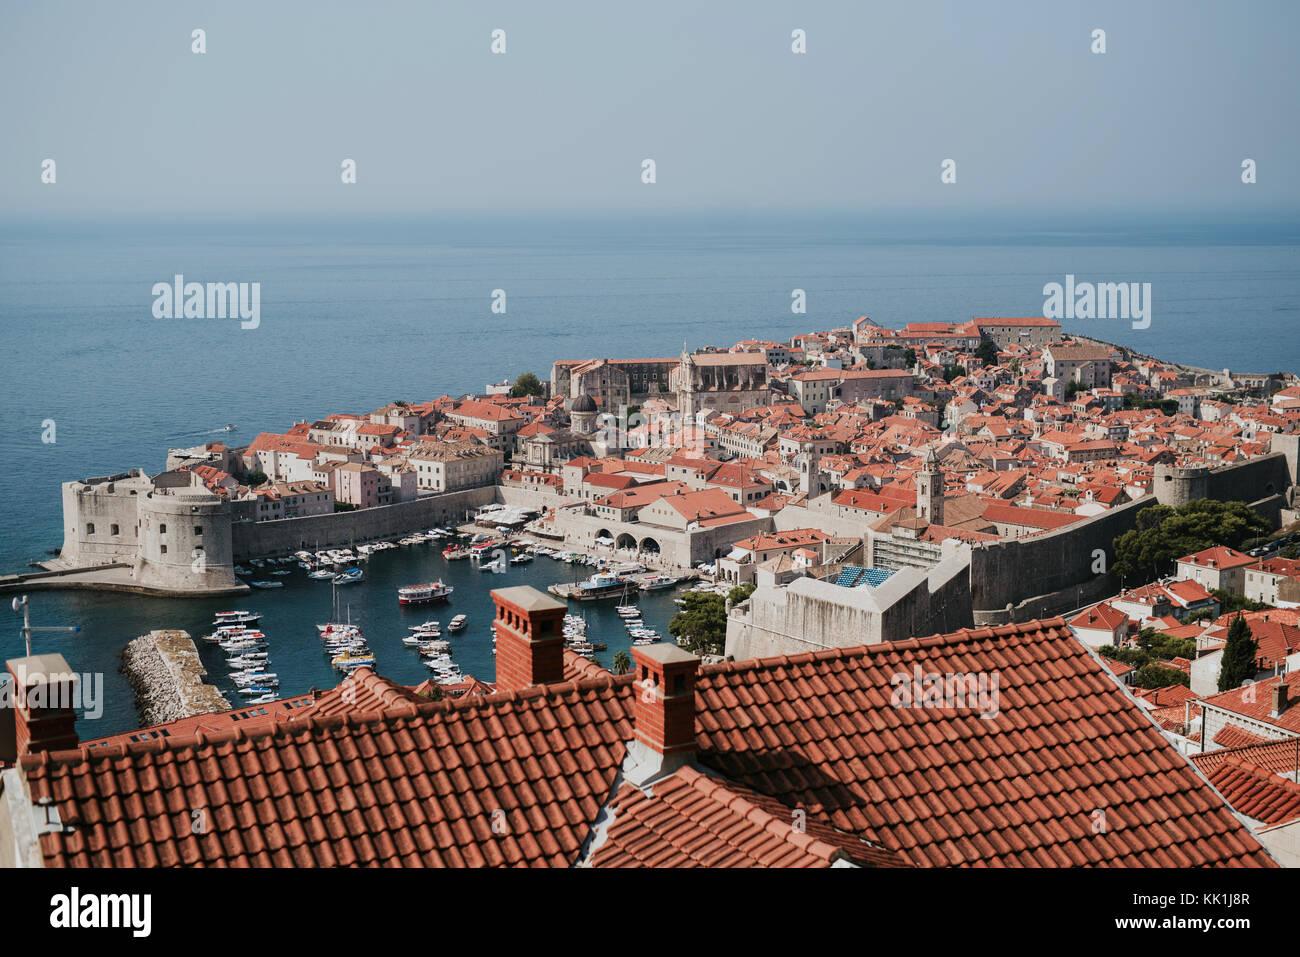 Beautiful old city of Dubrovnik in Croatia - Stock Image